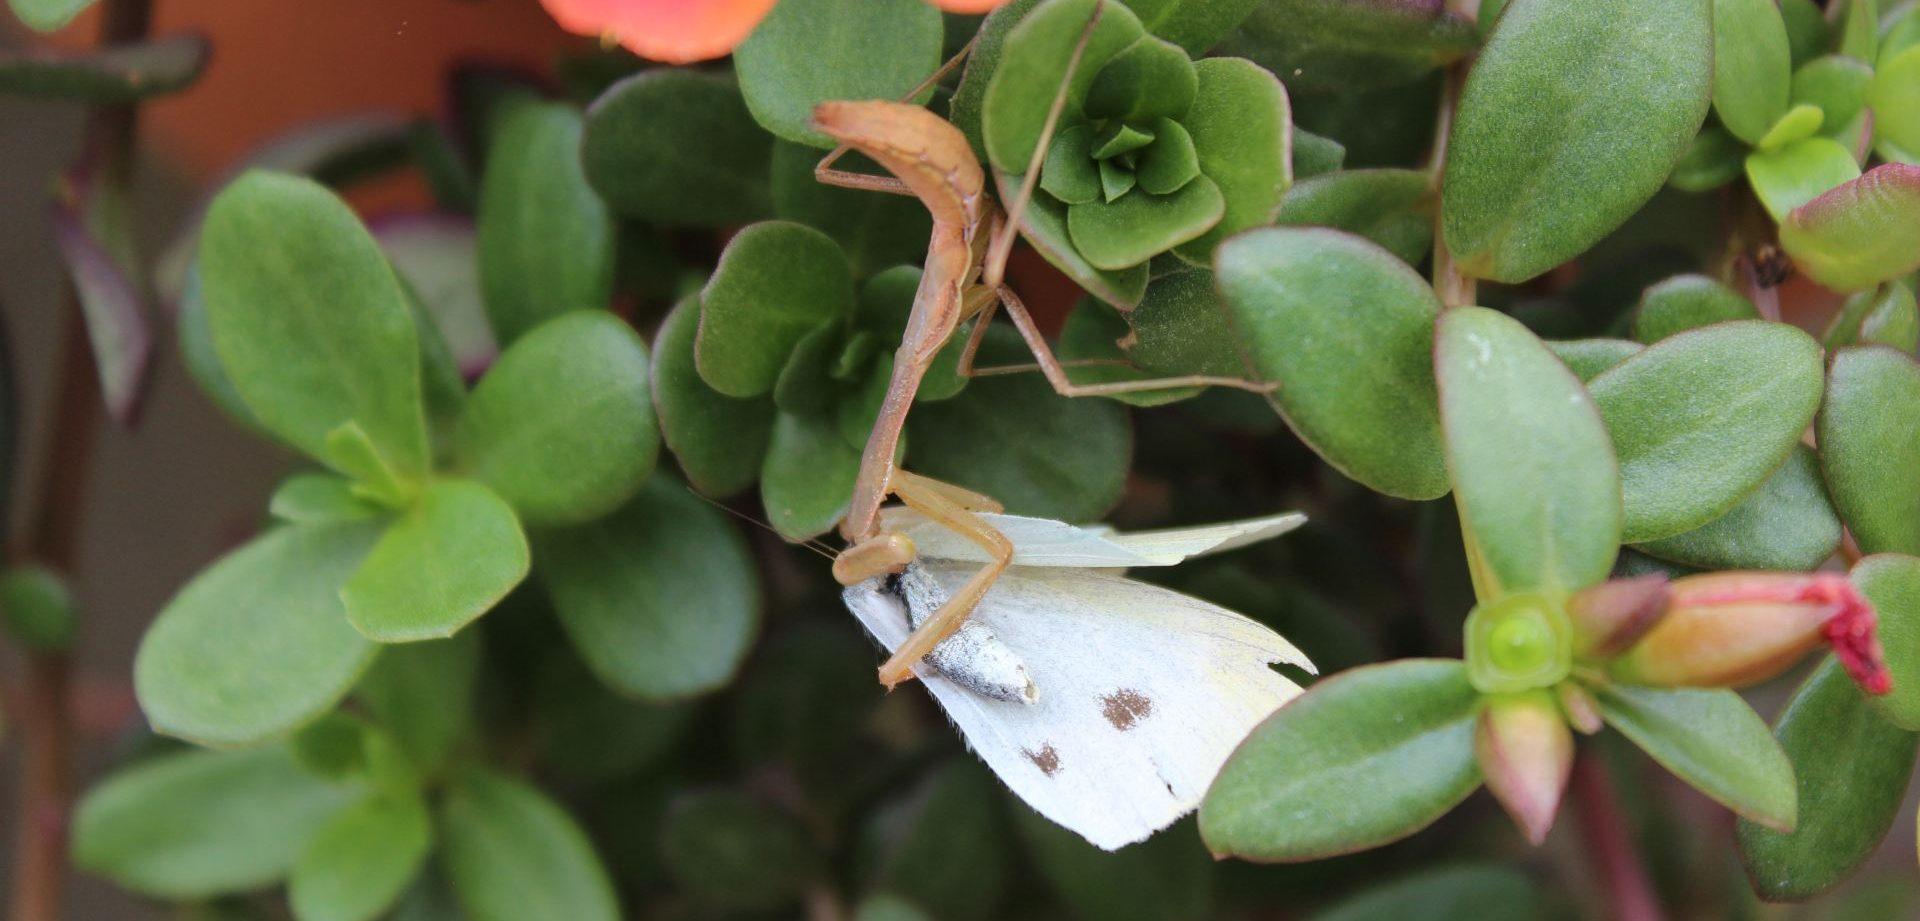 Attack of the killer Mantis